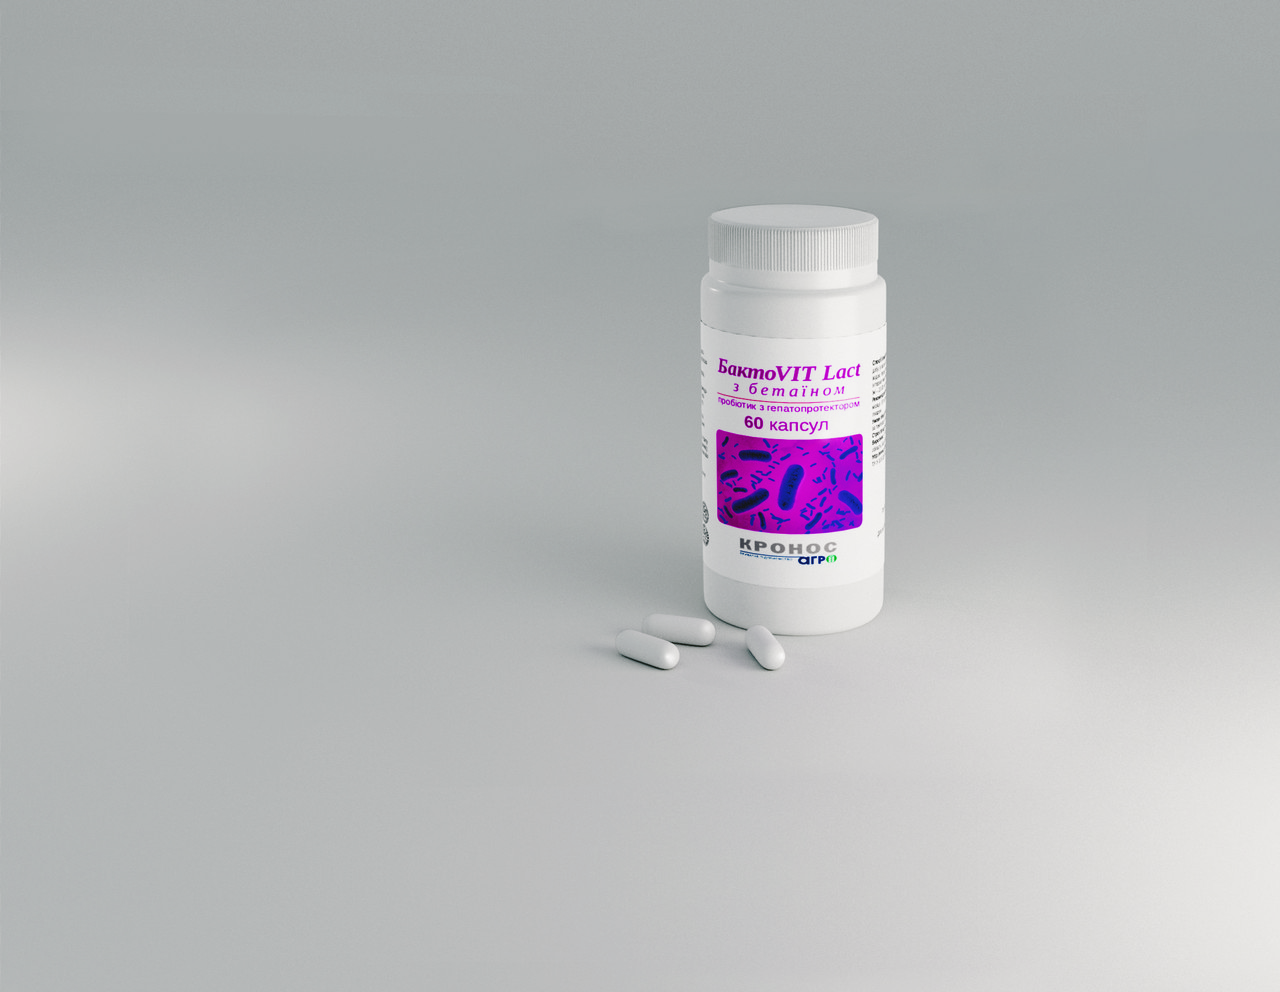 БактоVIT Lact с бетаином №60, пробиотик и гепатопротектор